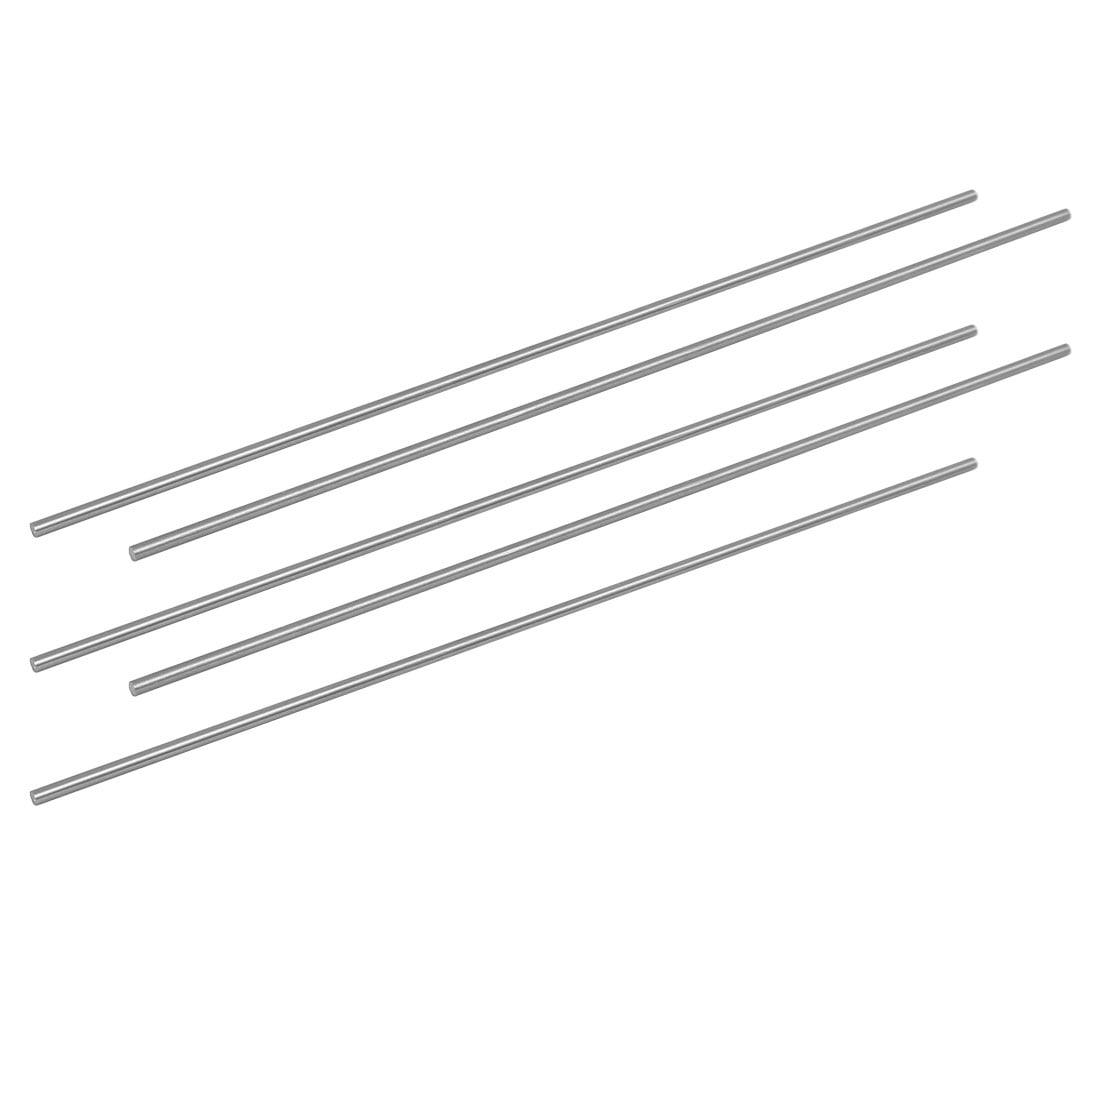 2.5mm Dia 200mm Length HSS Round Shaft Rod Bar Lathe Tools Gray